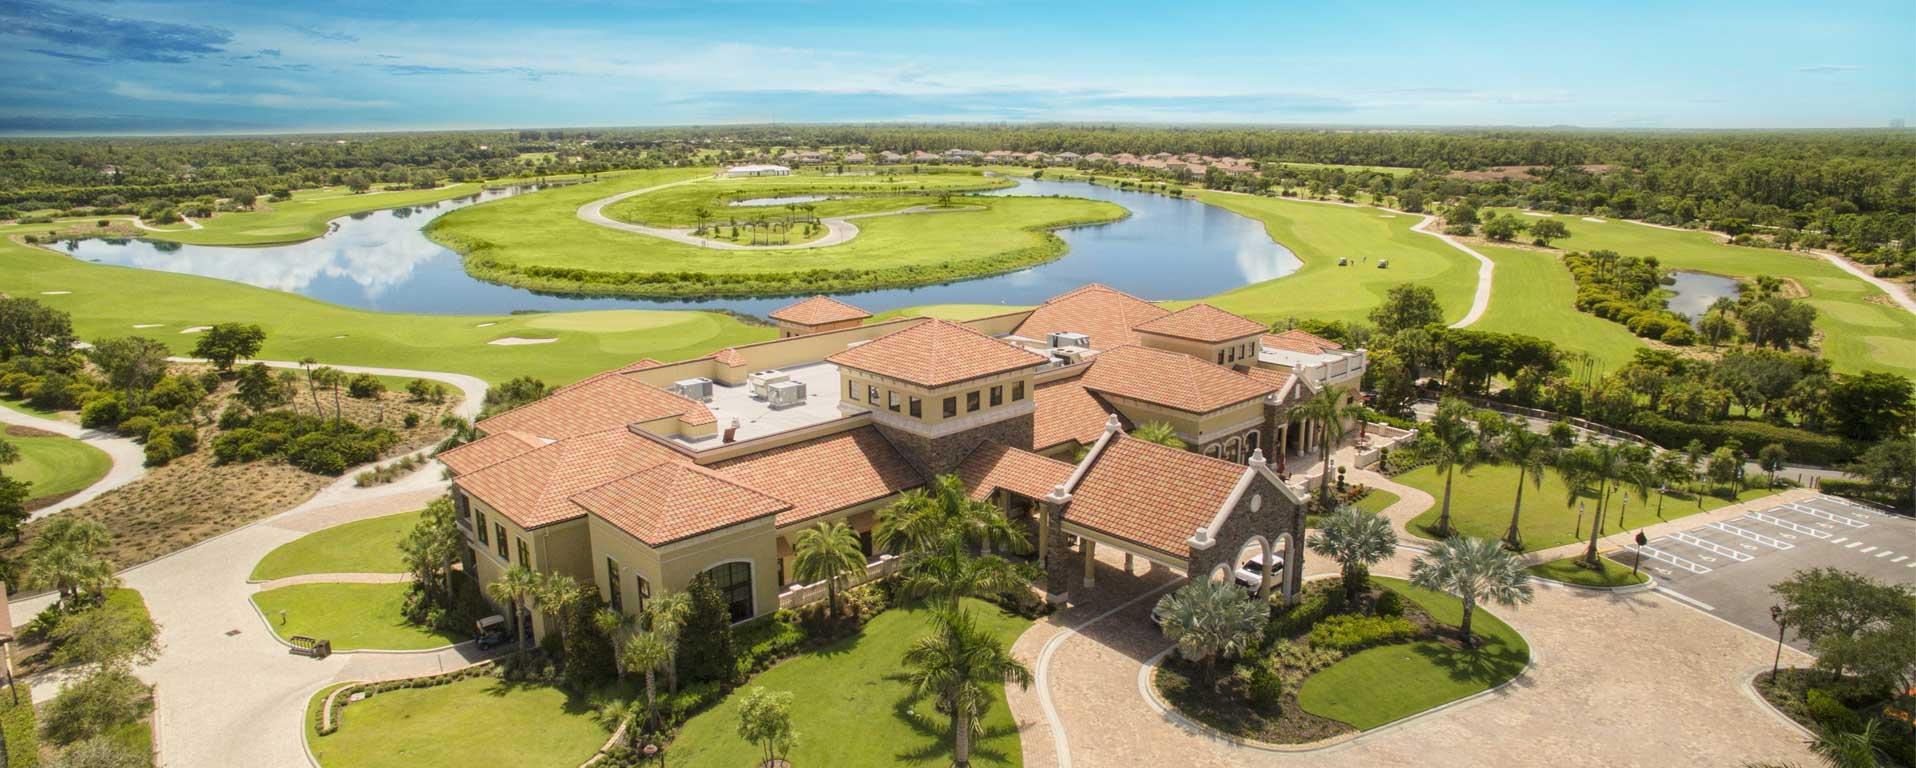 Estate Homes, Golf Course, Treviso Bay, Peninsula, TPC Golf, Naples, Florida, Paradise Coast, Peninsula Treviso Bay, Model Home, Clubhouse